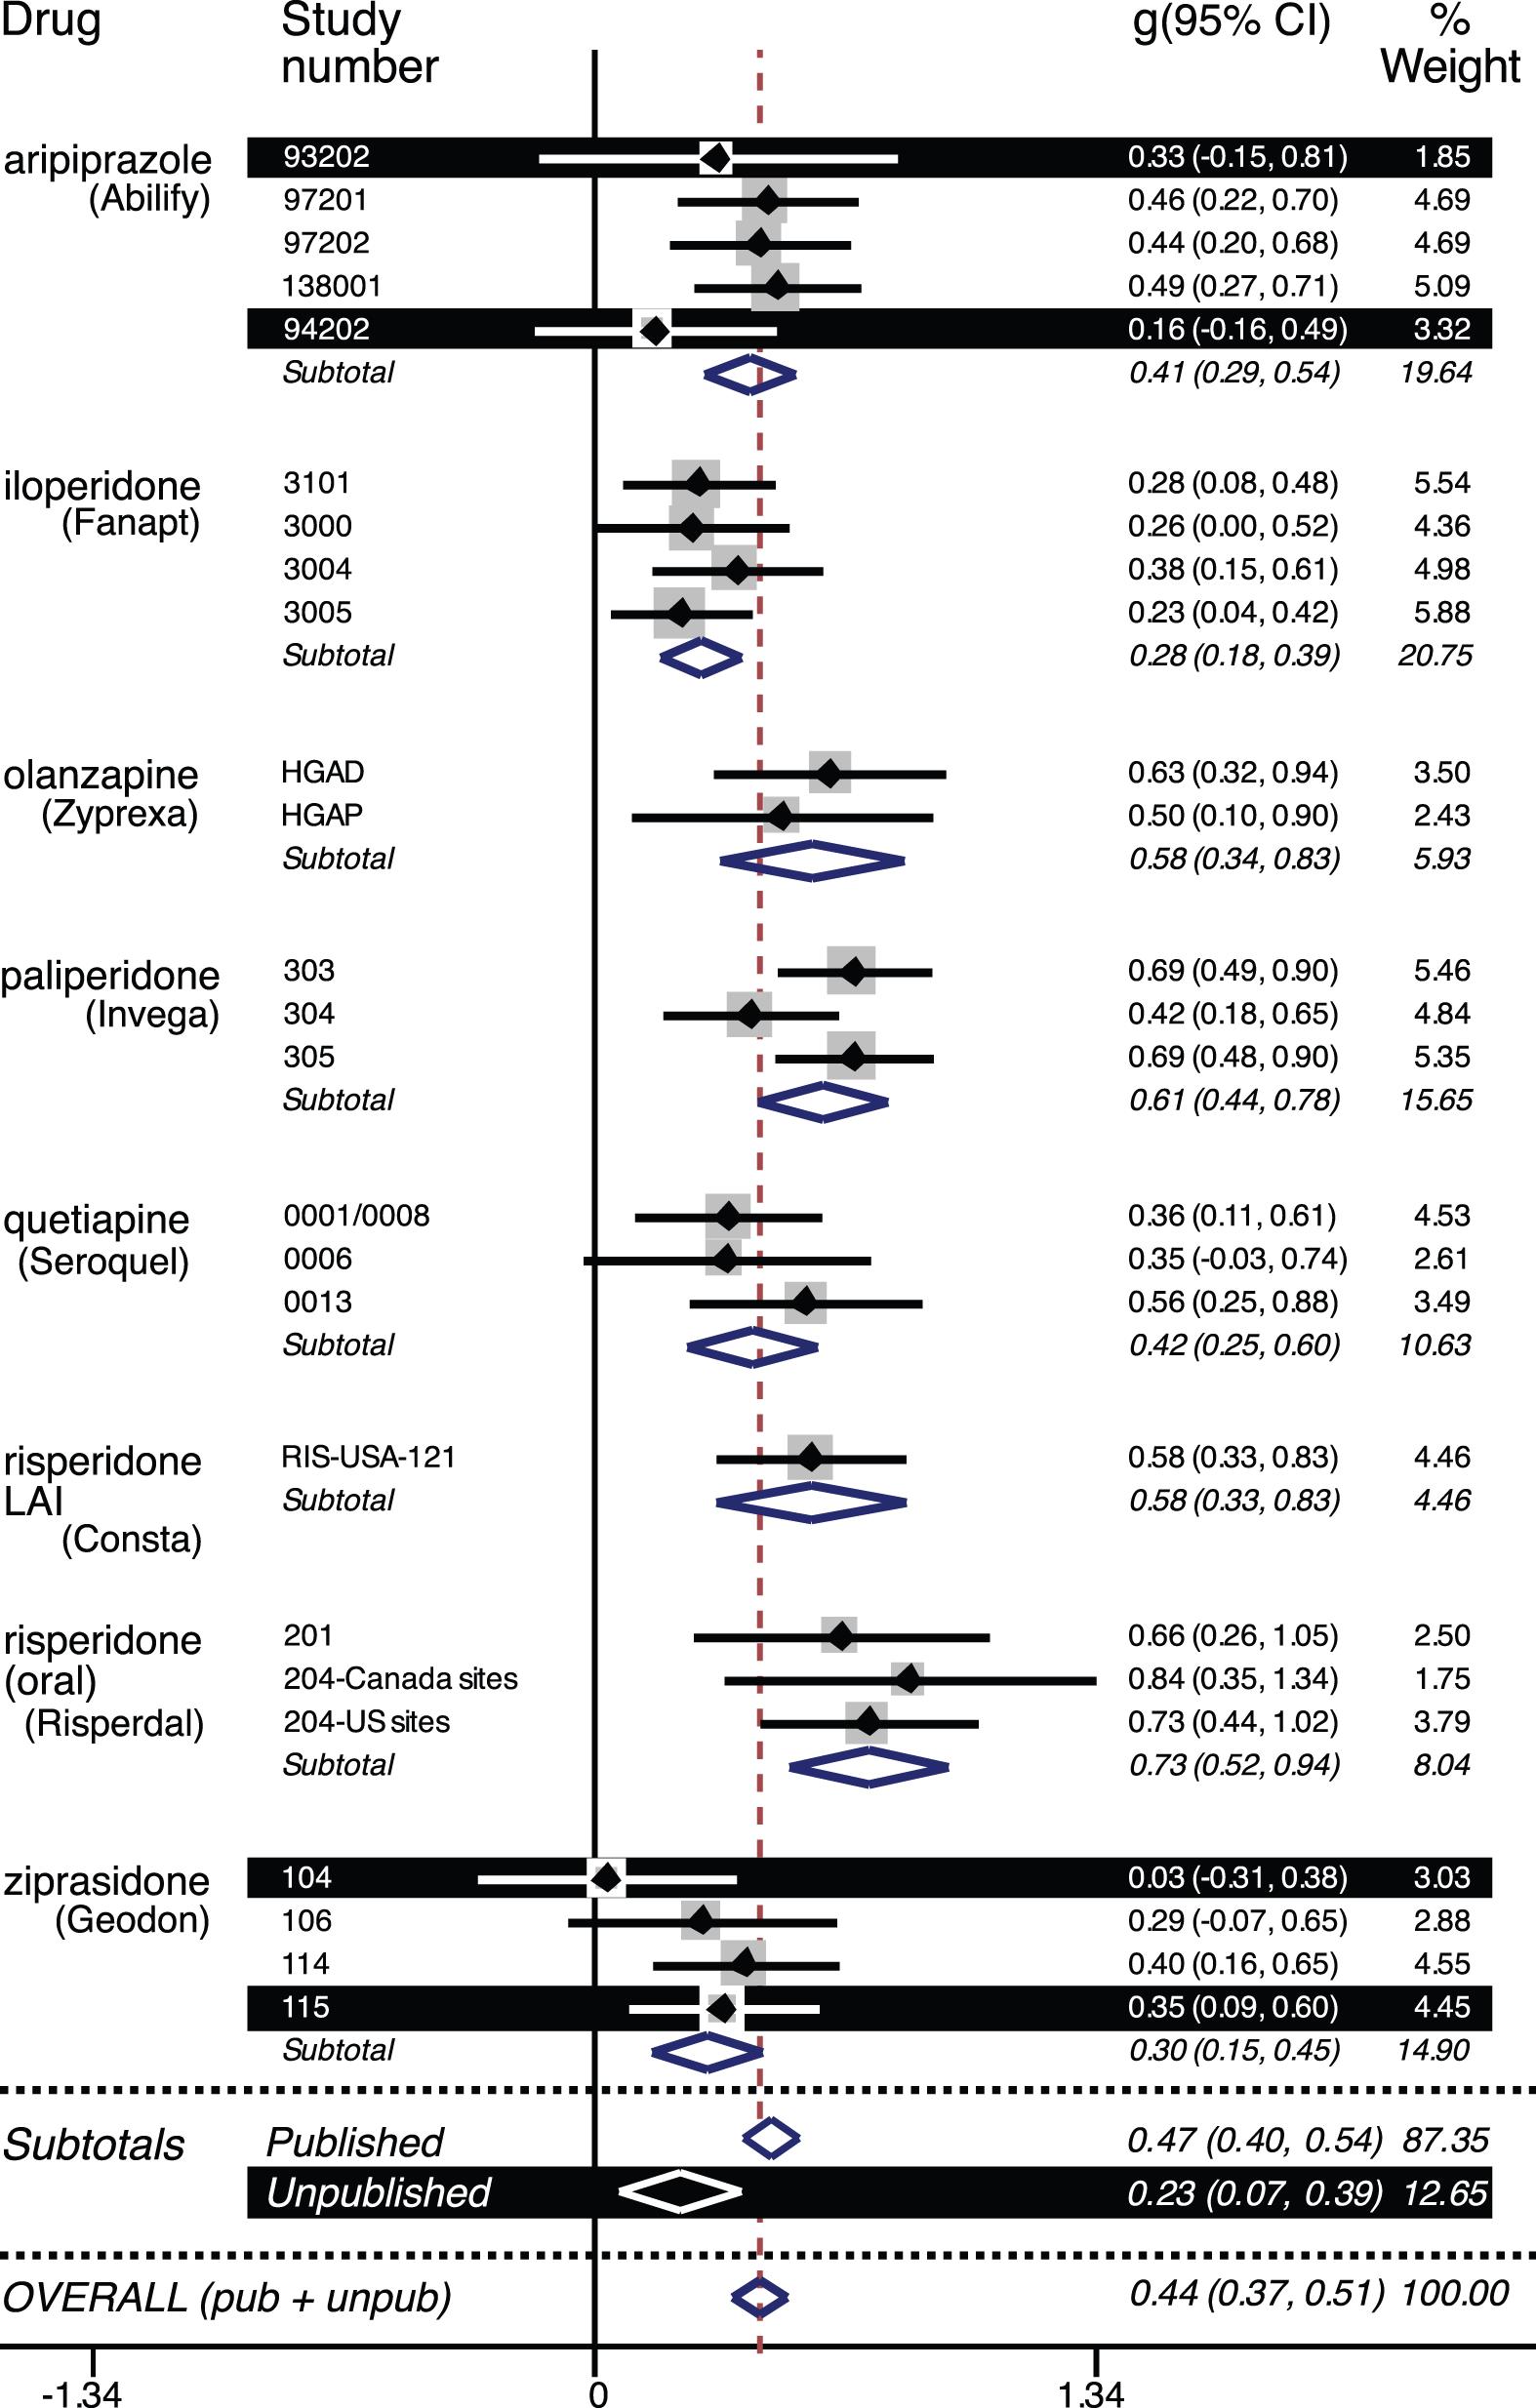 Forest plot of effect size (Hedges's <i>g</i>) values for FDA-registered premarketing trials of second-generation antipsychotics.